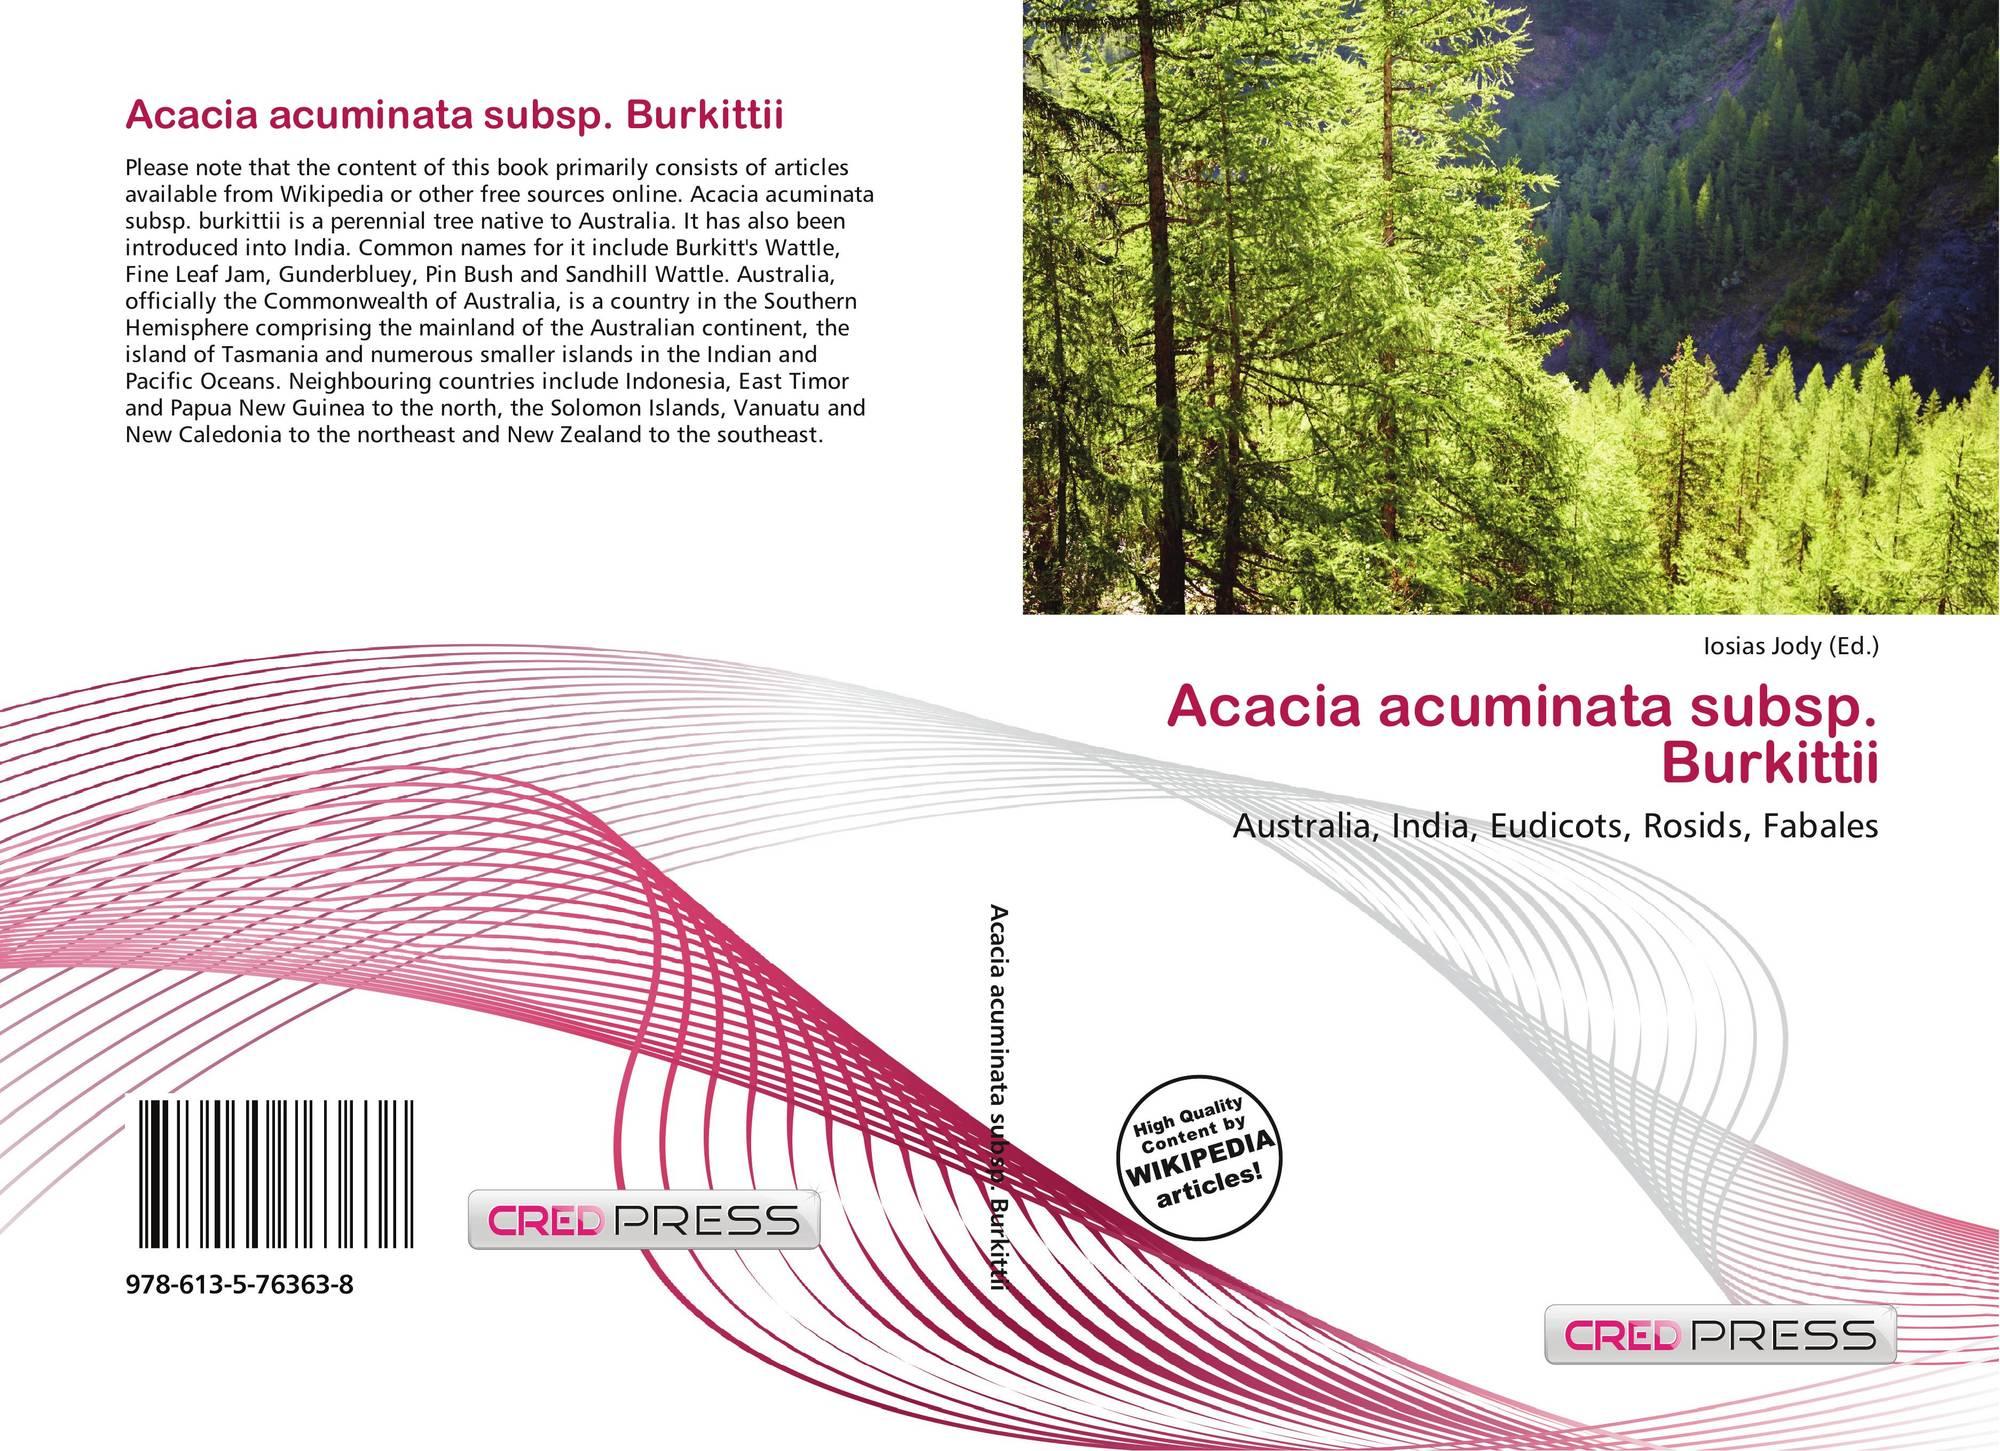 Acacia Acuminata Subsp Burkittii 978 613 5 76363 8 6135763636